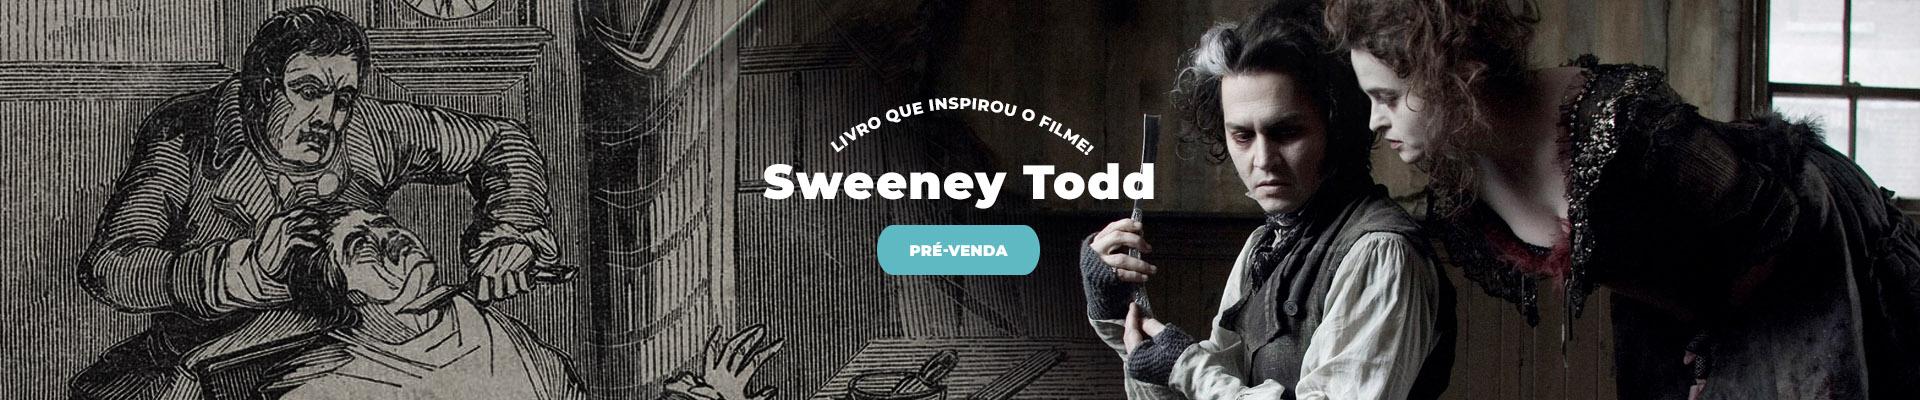 Pré-venda: Sweeney Todd